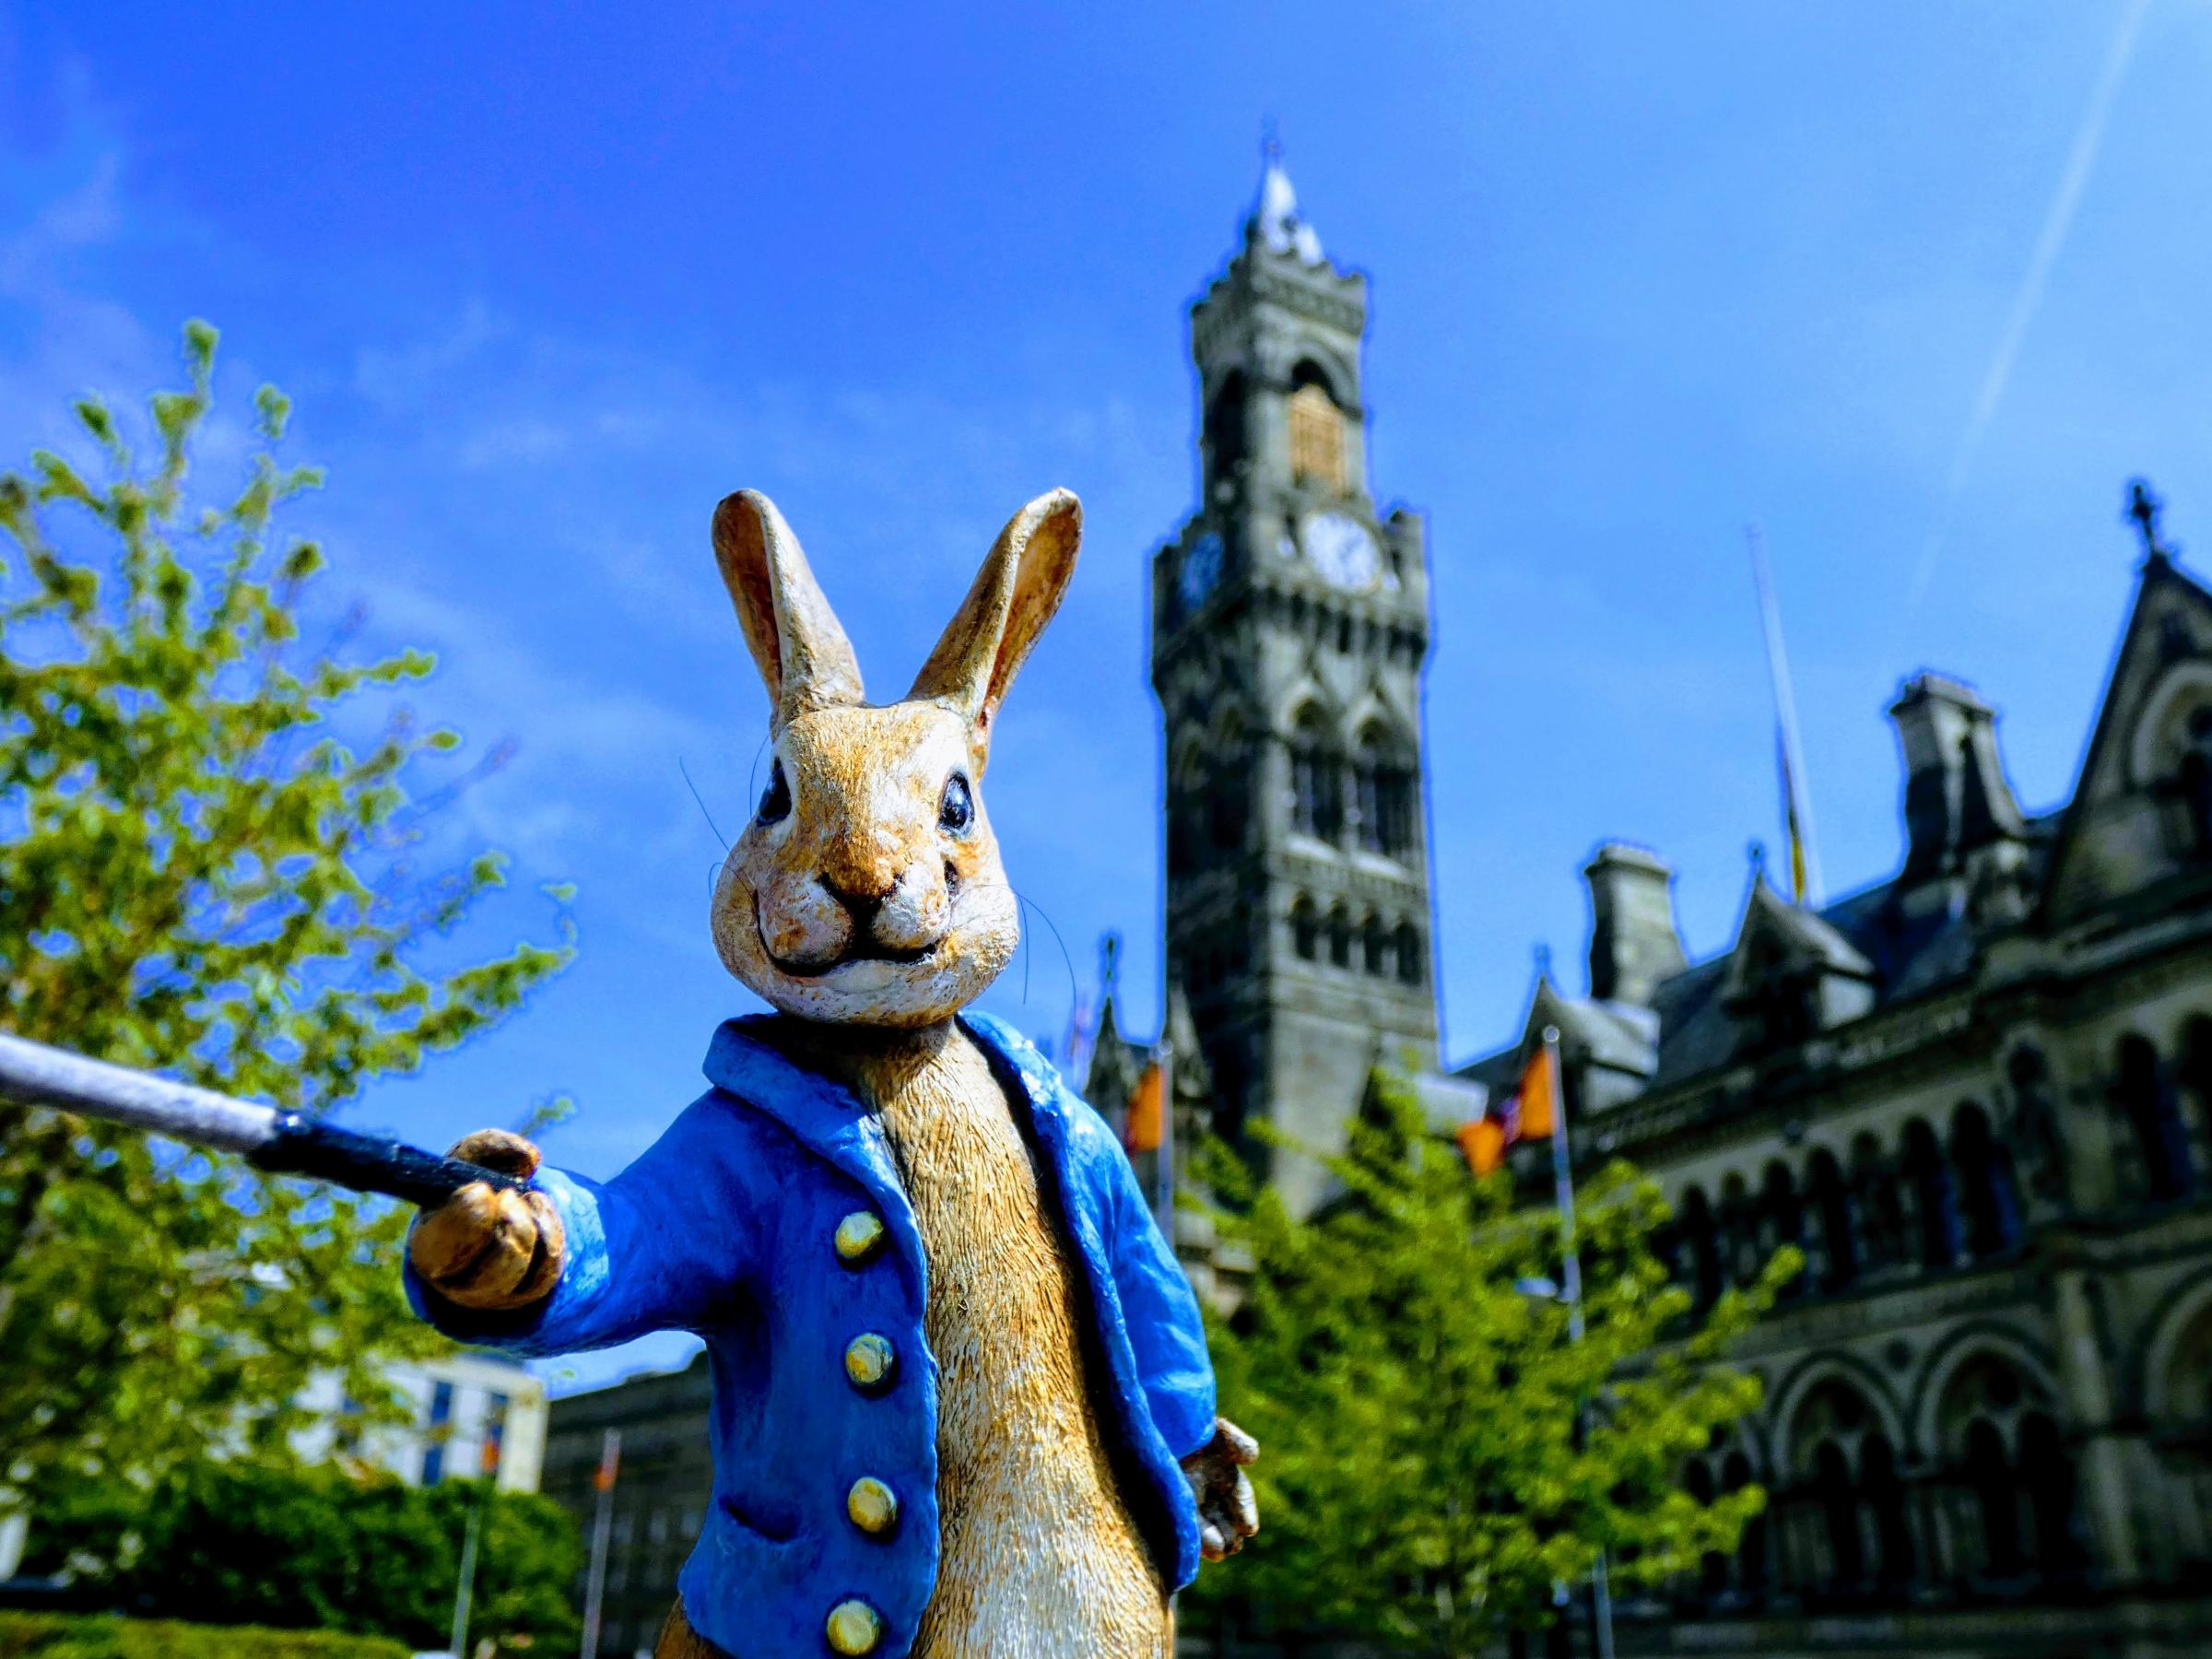 Last chance to visit Peter Rabbit exhibition